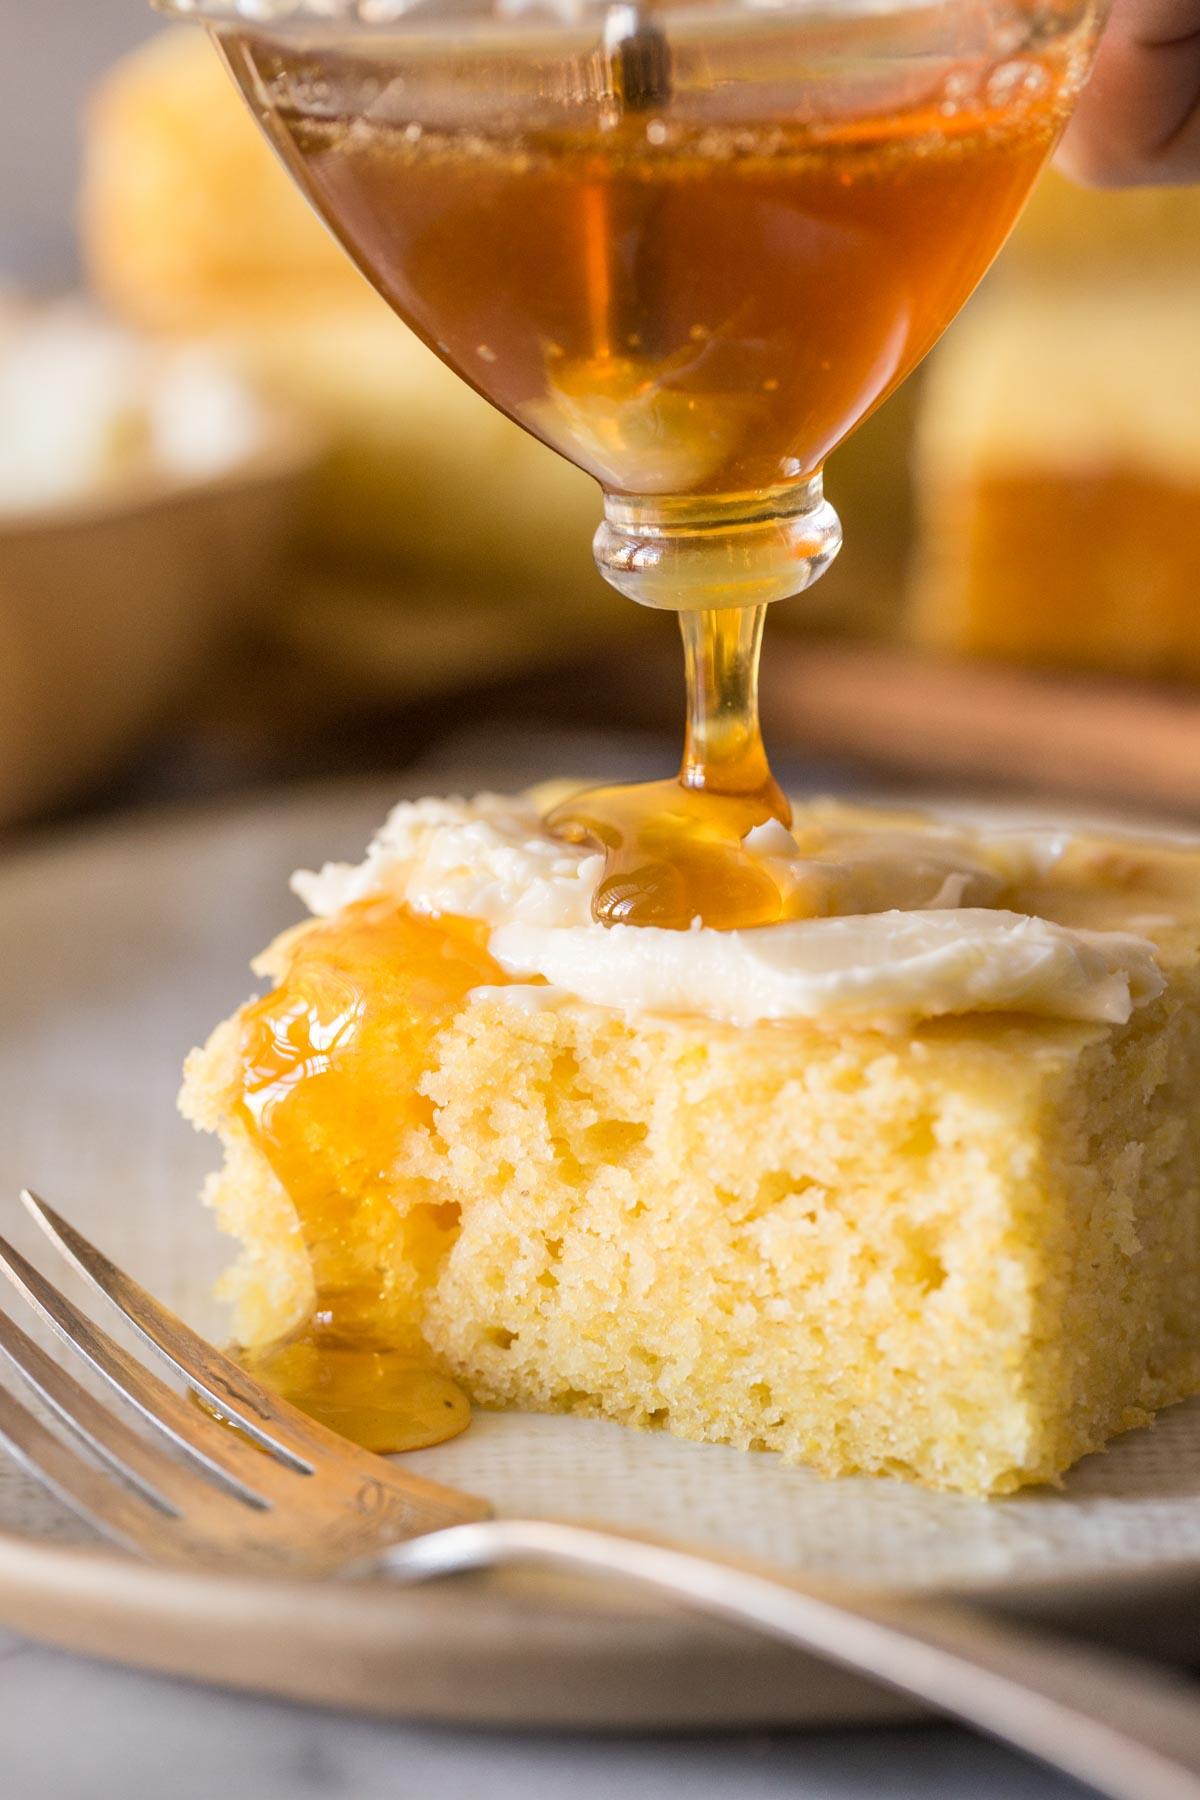 Honey drizzled over Easy Homemade Cornbread slice.